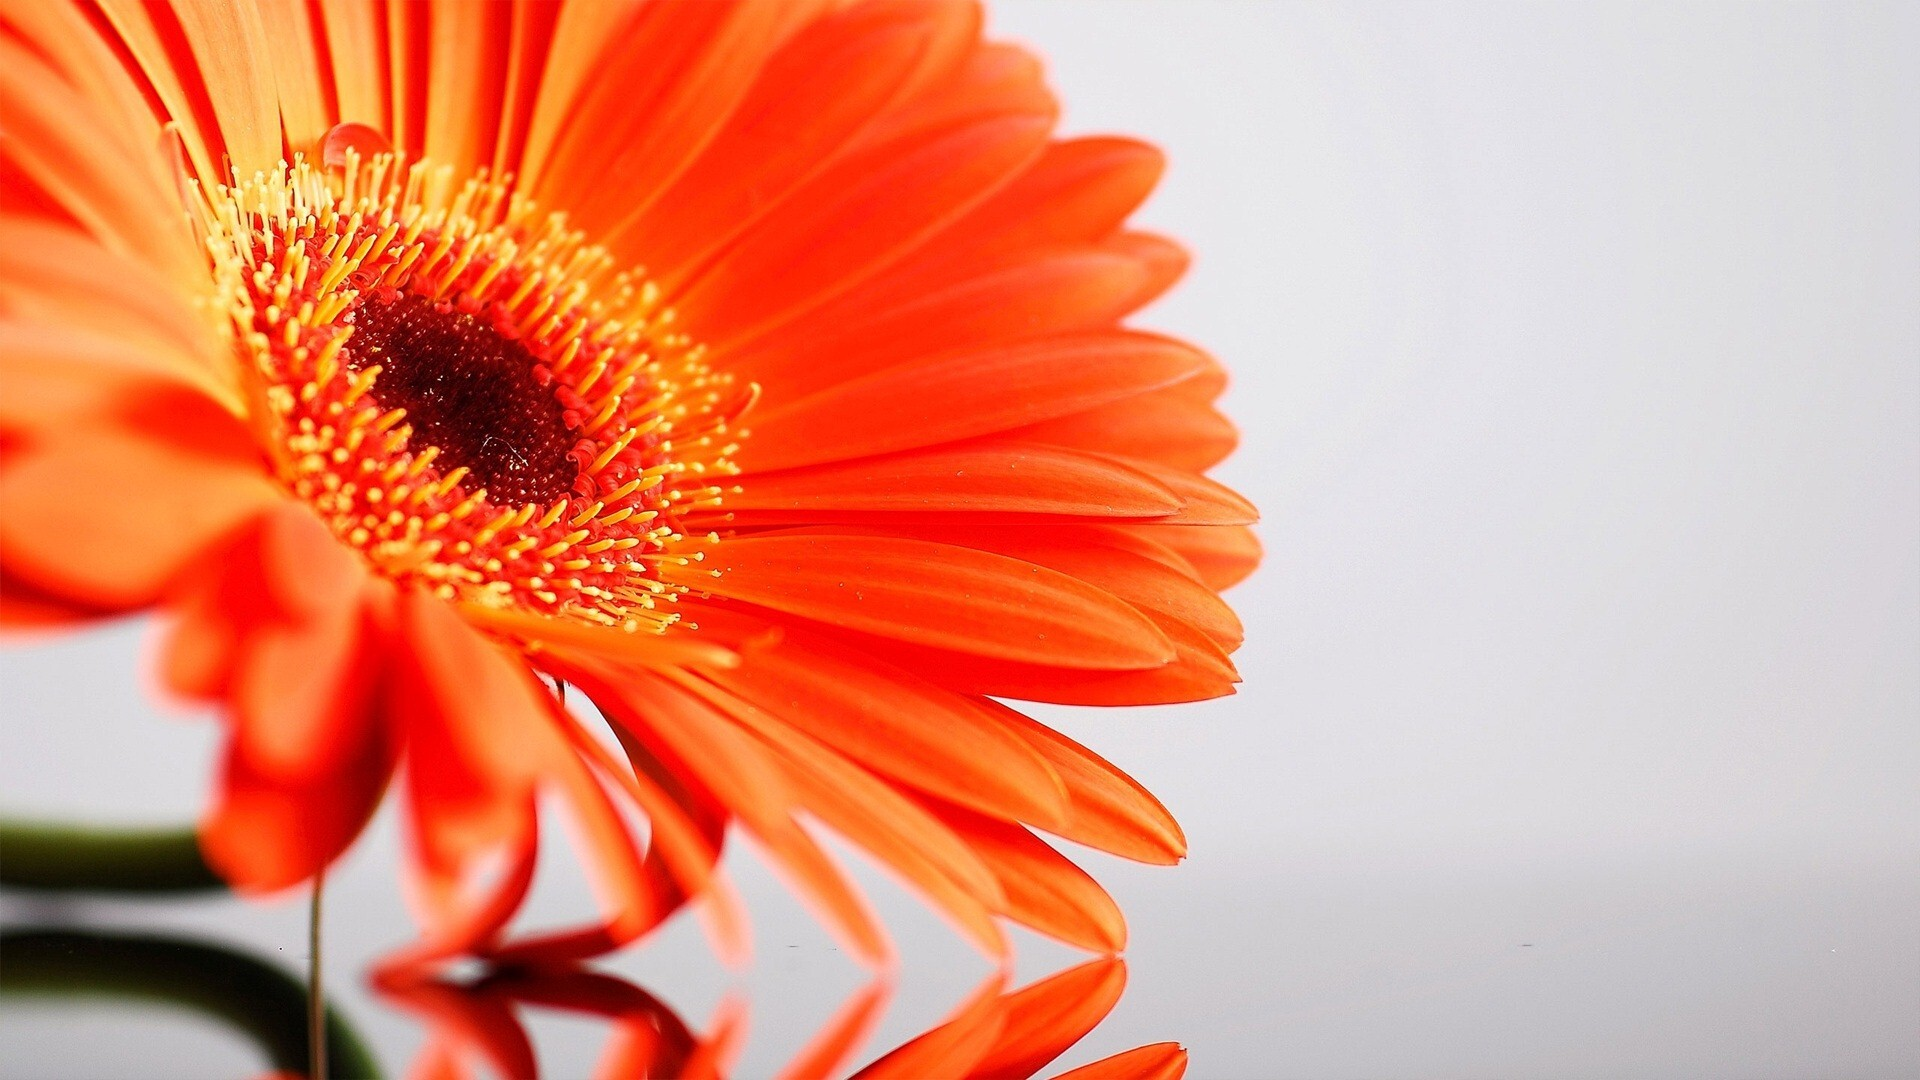 Amazing Sunflower HD Desktop Background Wallpapers For Laptop